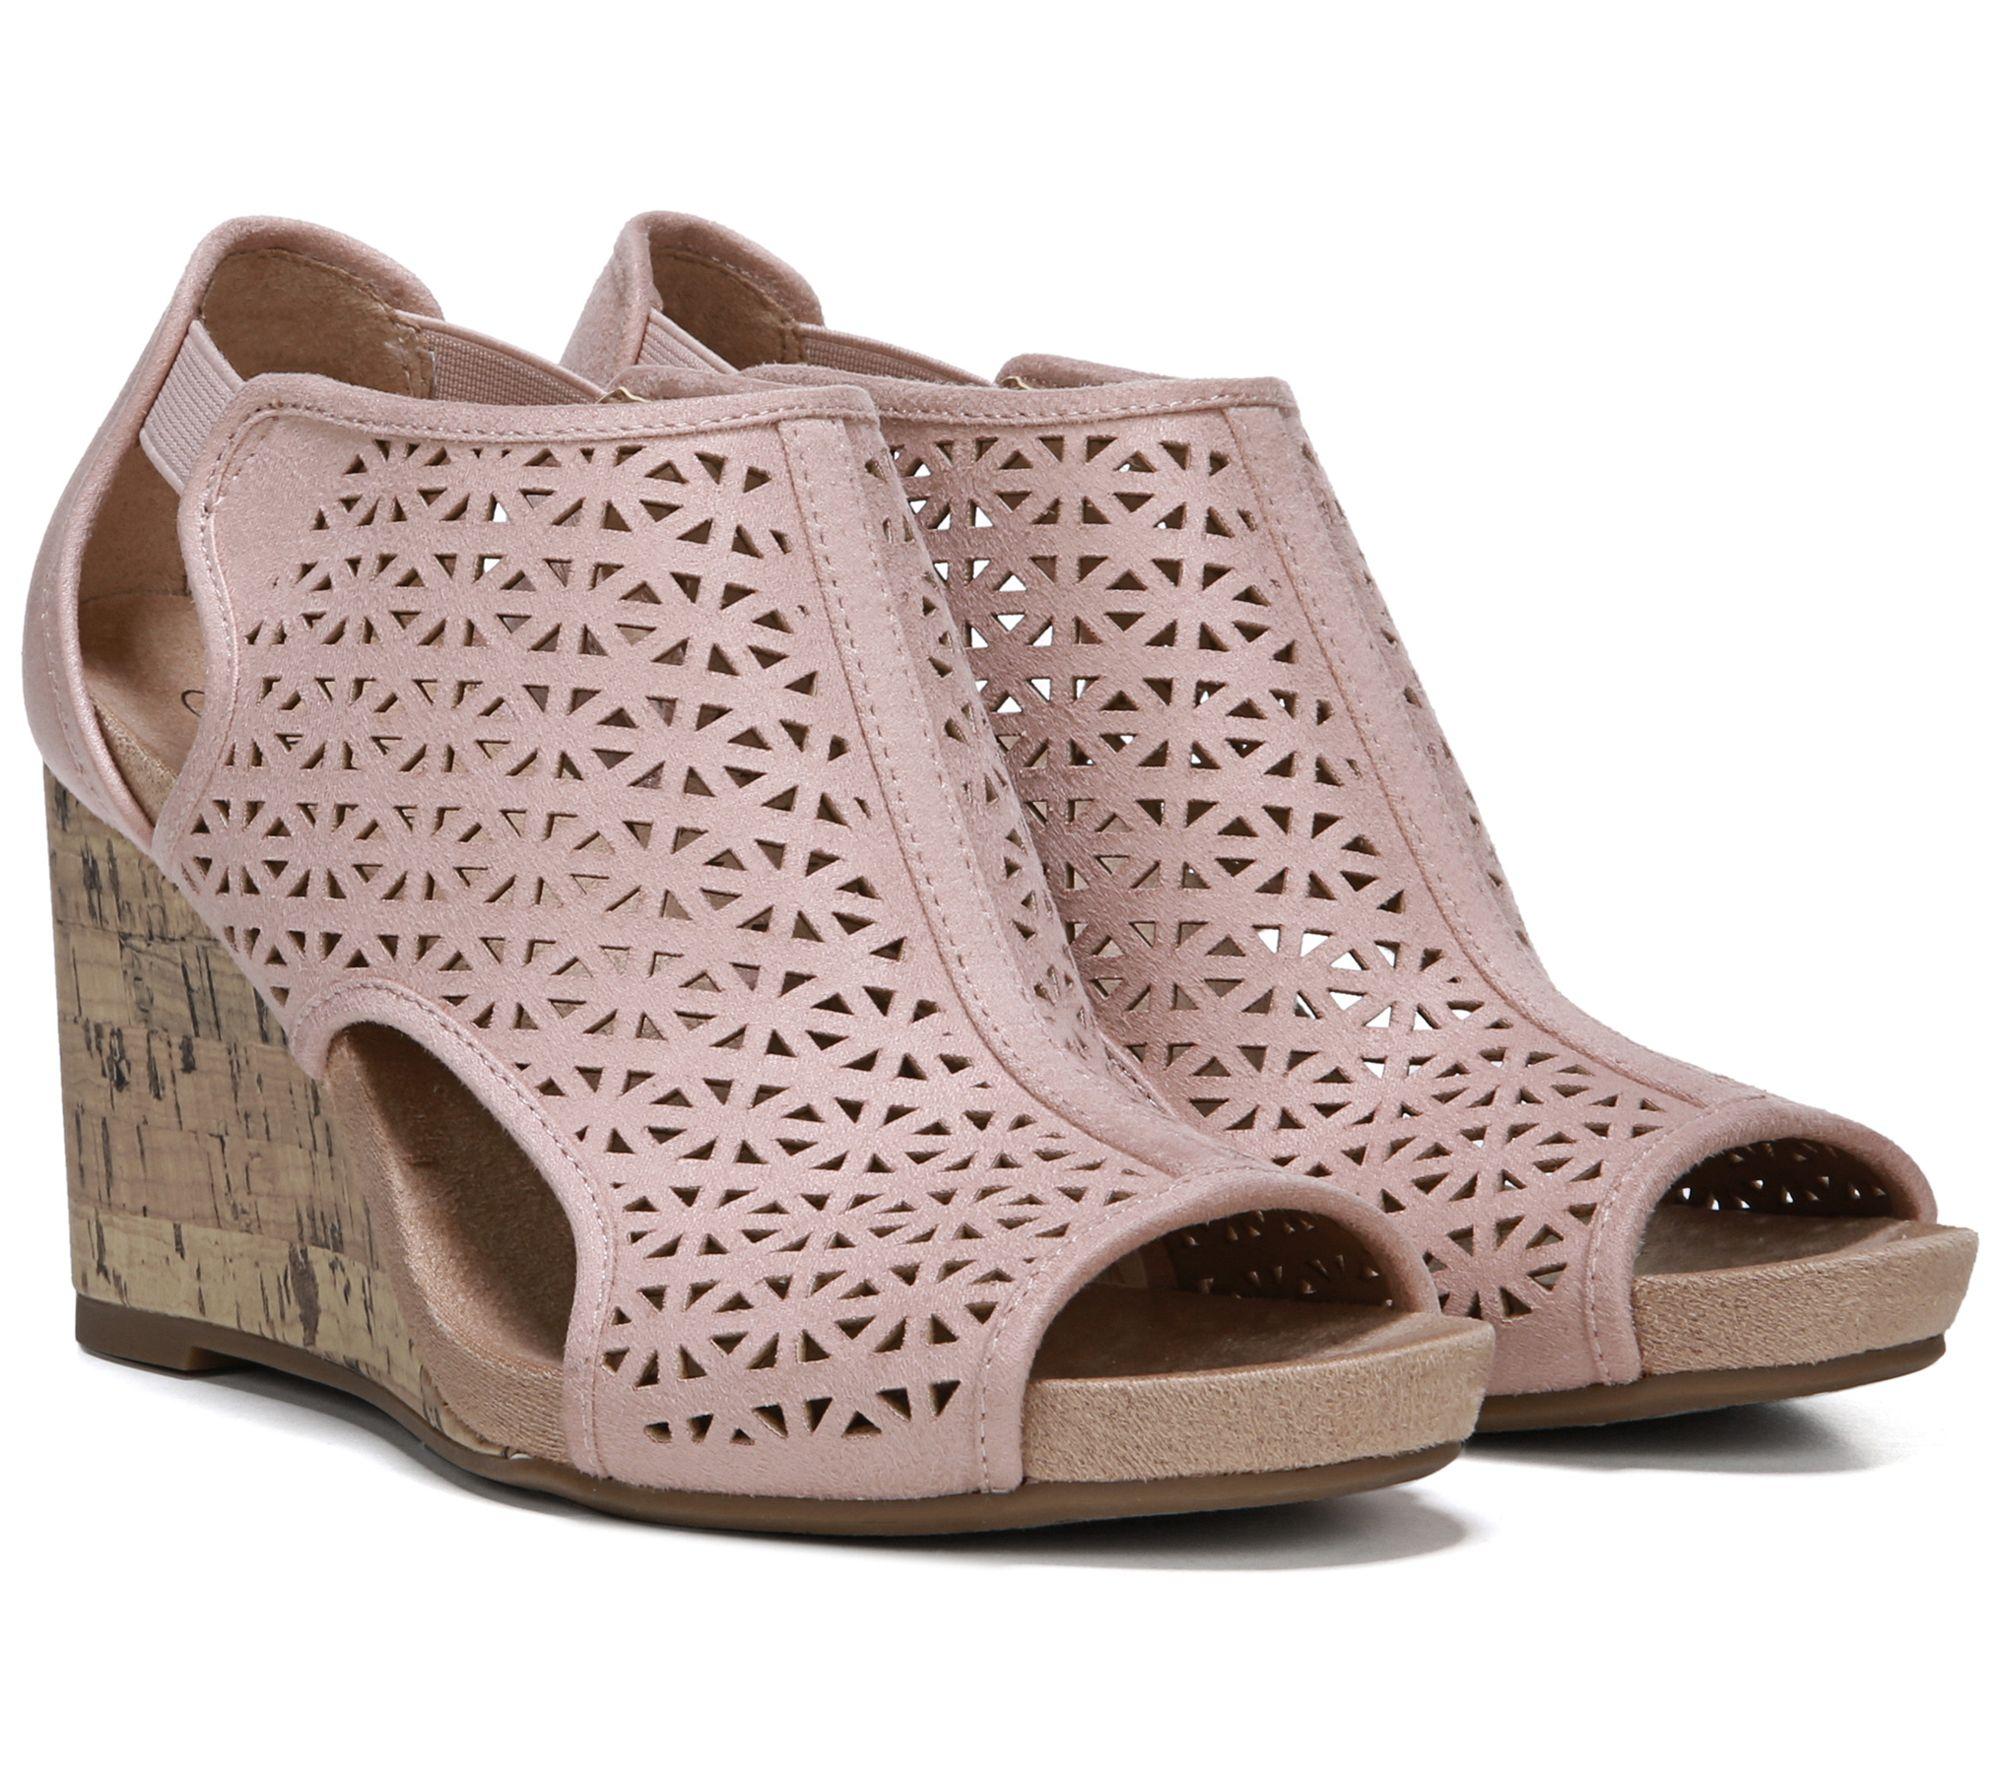 5be6a700043 LifeStride Peep Toe Wedge Sandals - Hinx 2 — QVC.com